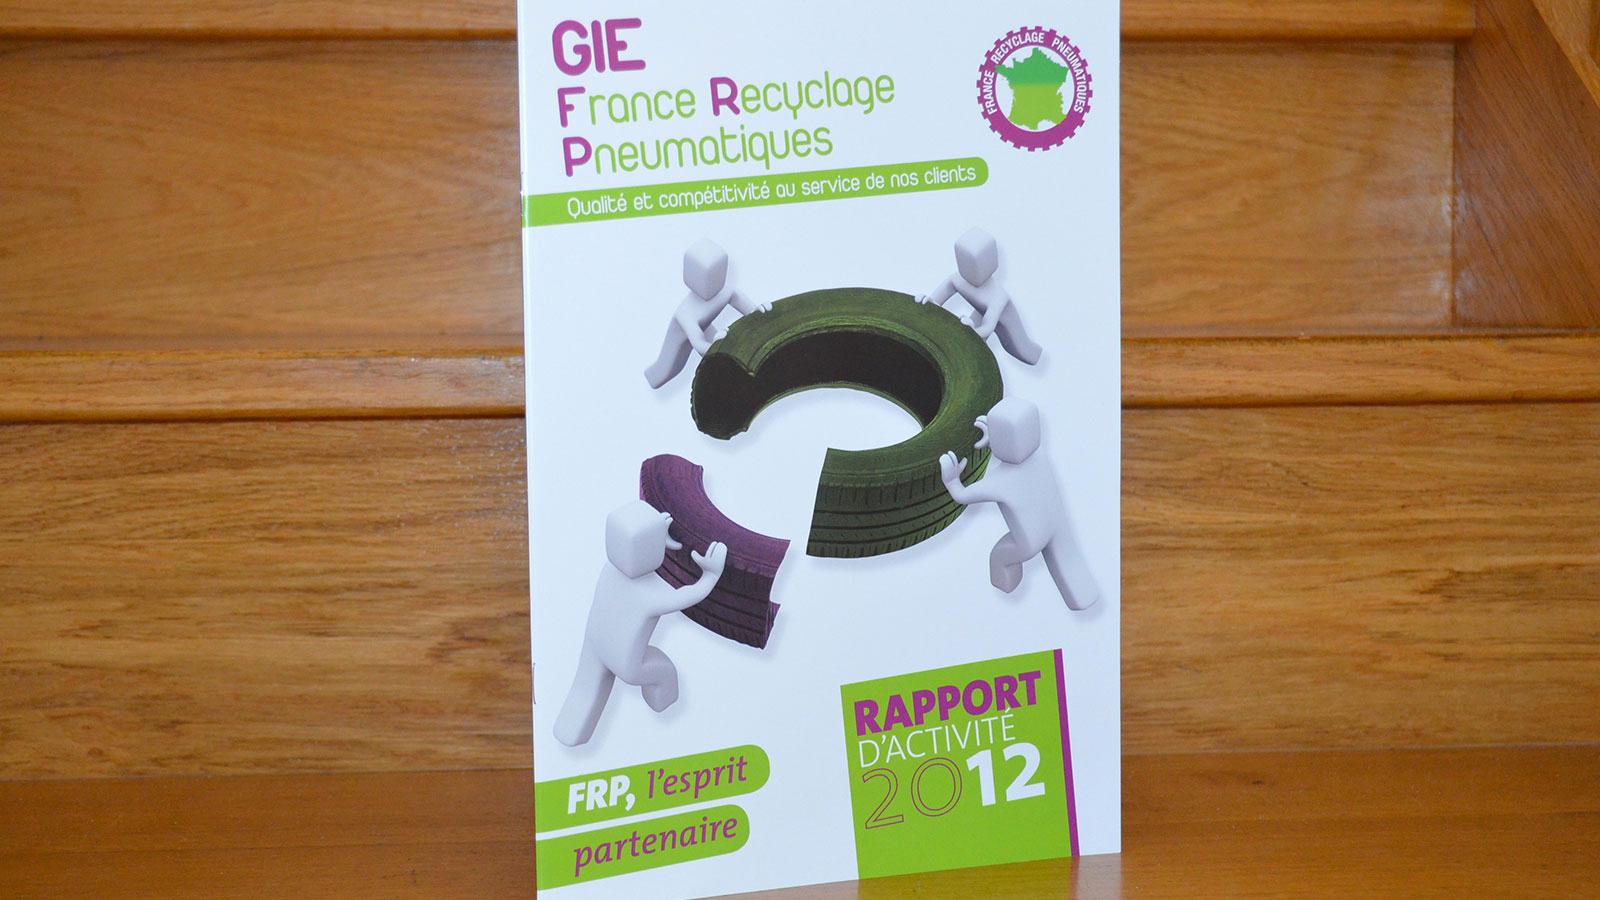 FRP (France Recyclage Pneumatiques)